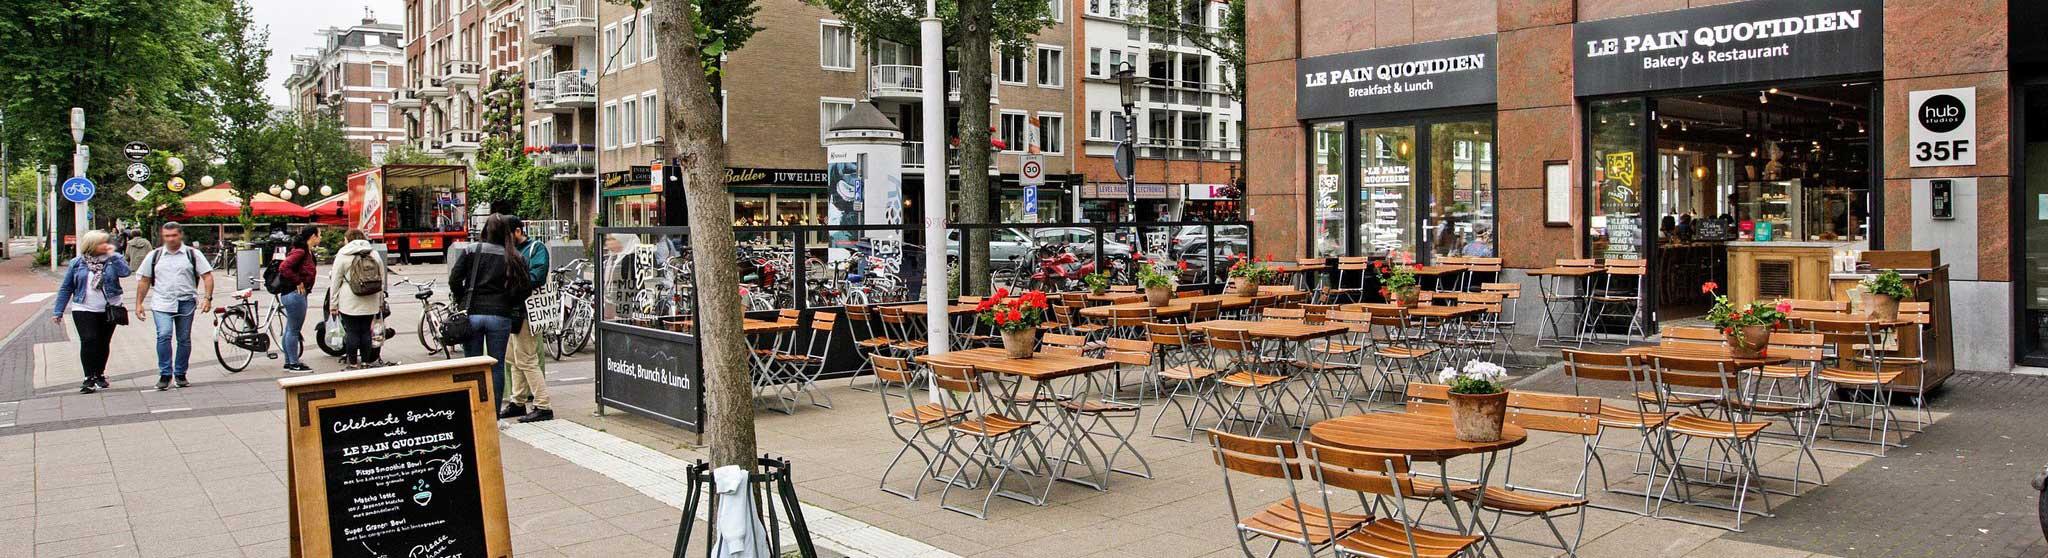 Buurtinformatie-Dapperbuurt-Amsterdam